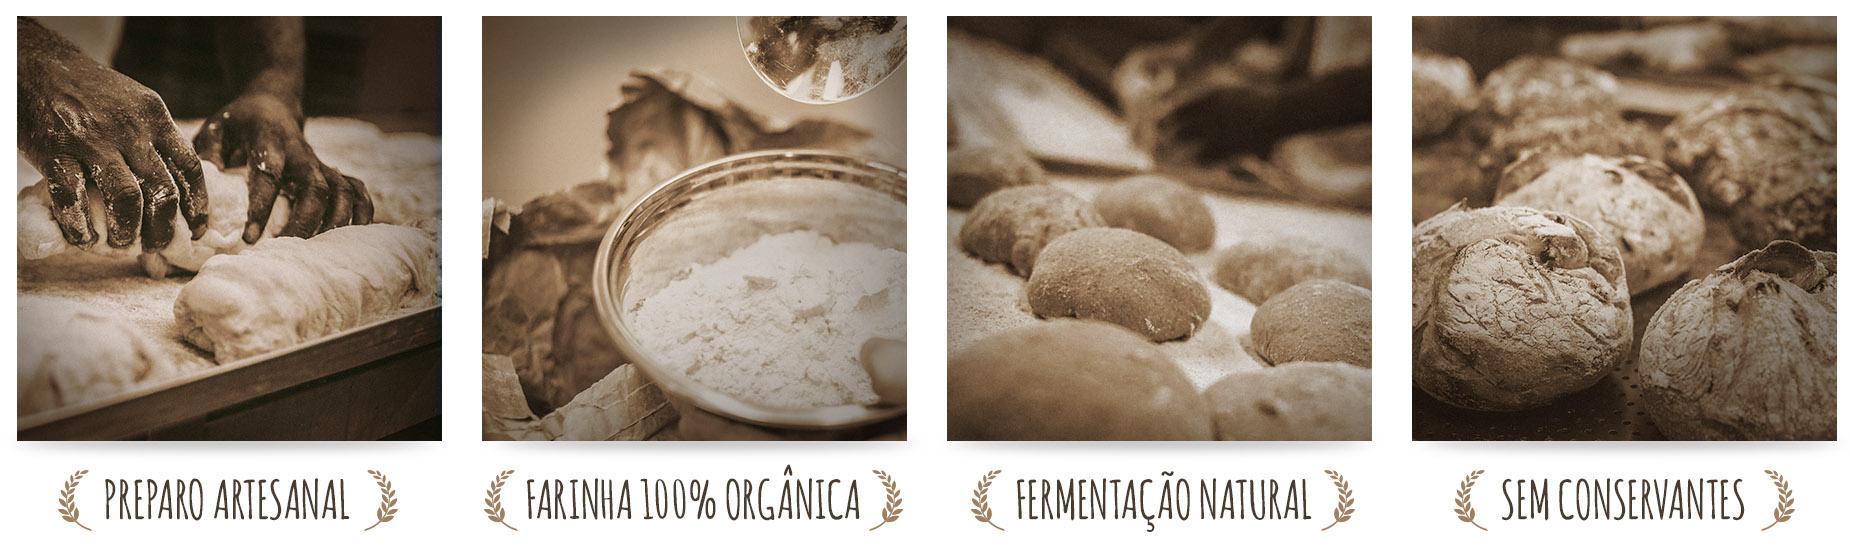 a-fornada-padaria-artesanal-organica-diferenciais.jpg